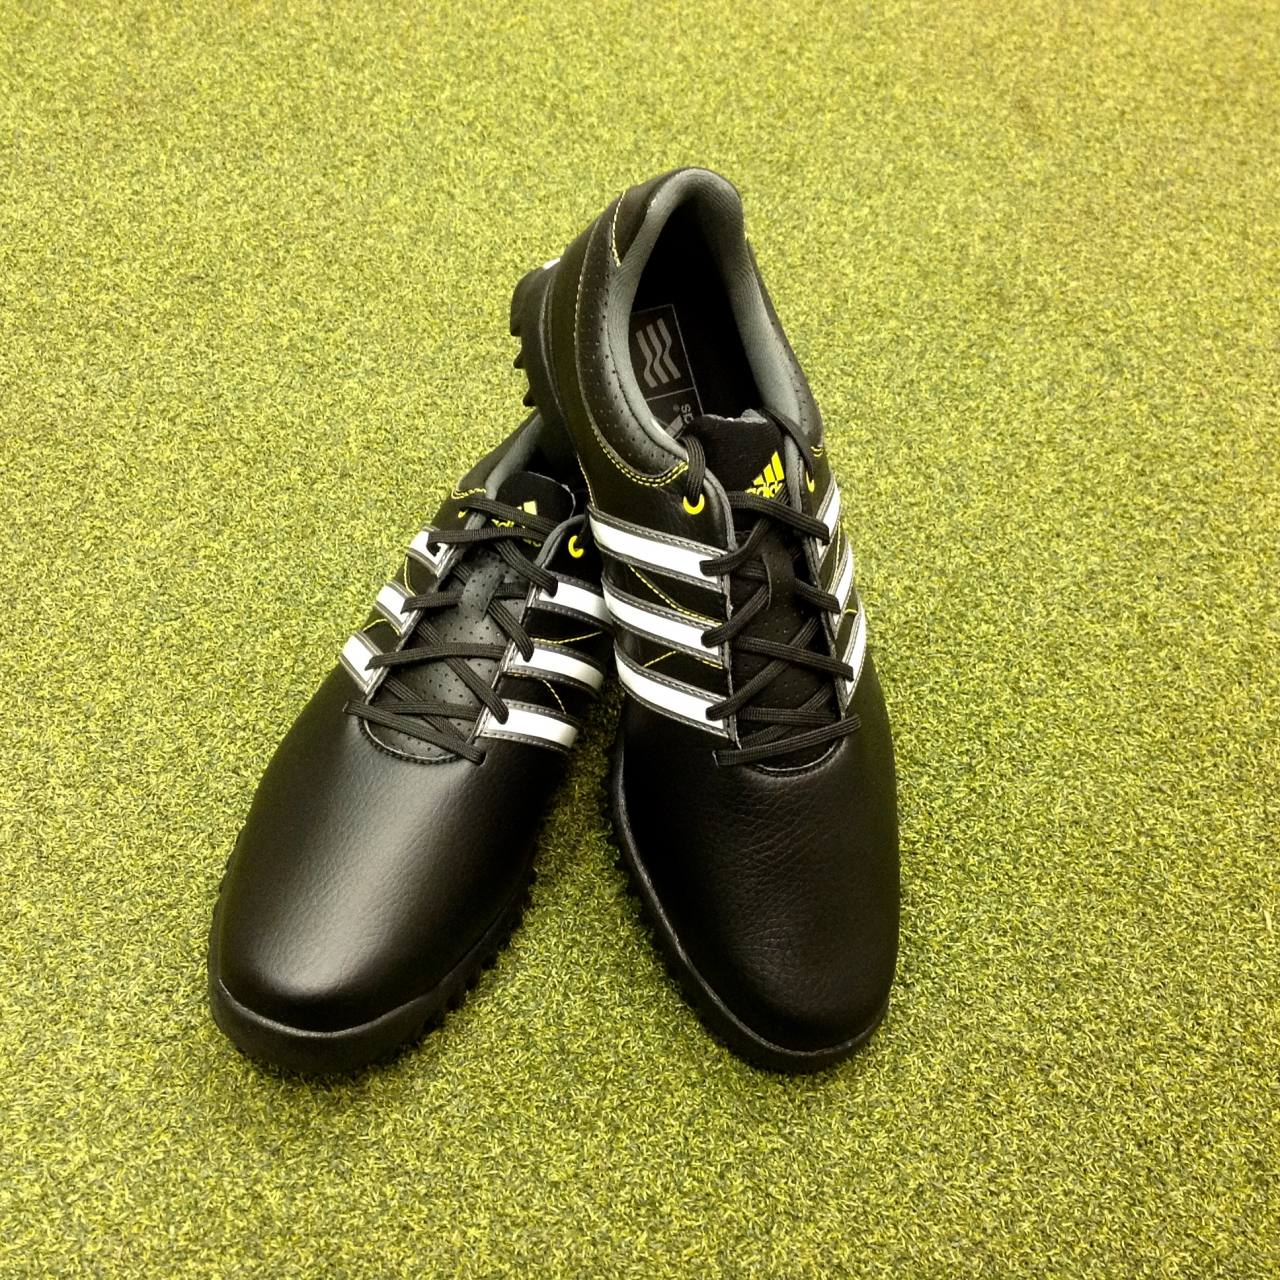 Adidas Tour 360 Lite Golf Shoes - UK